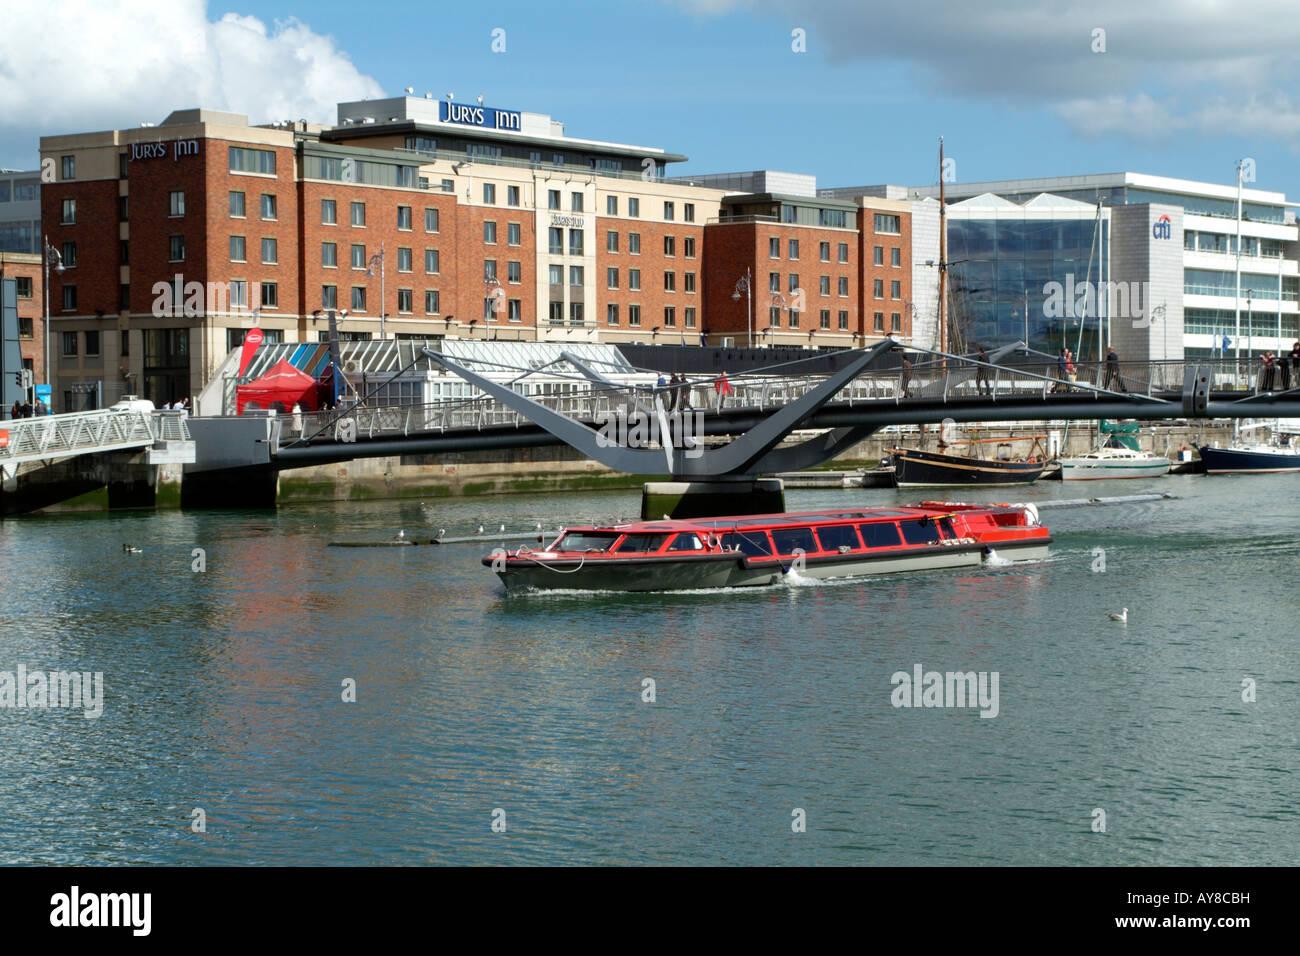 River Liffey Tourist Cruise Boat Passing Dublin City Mooring Stock Photo